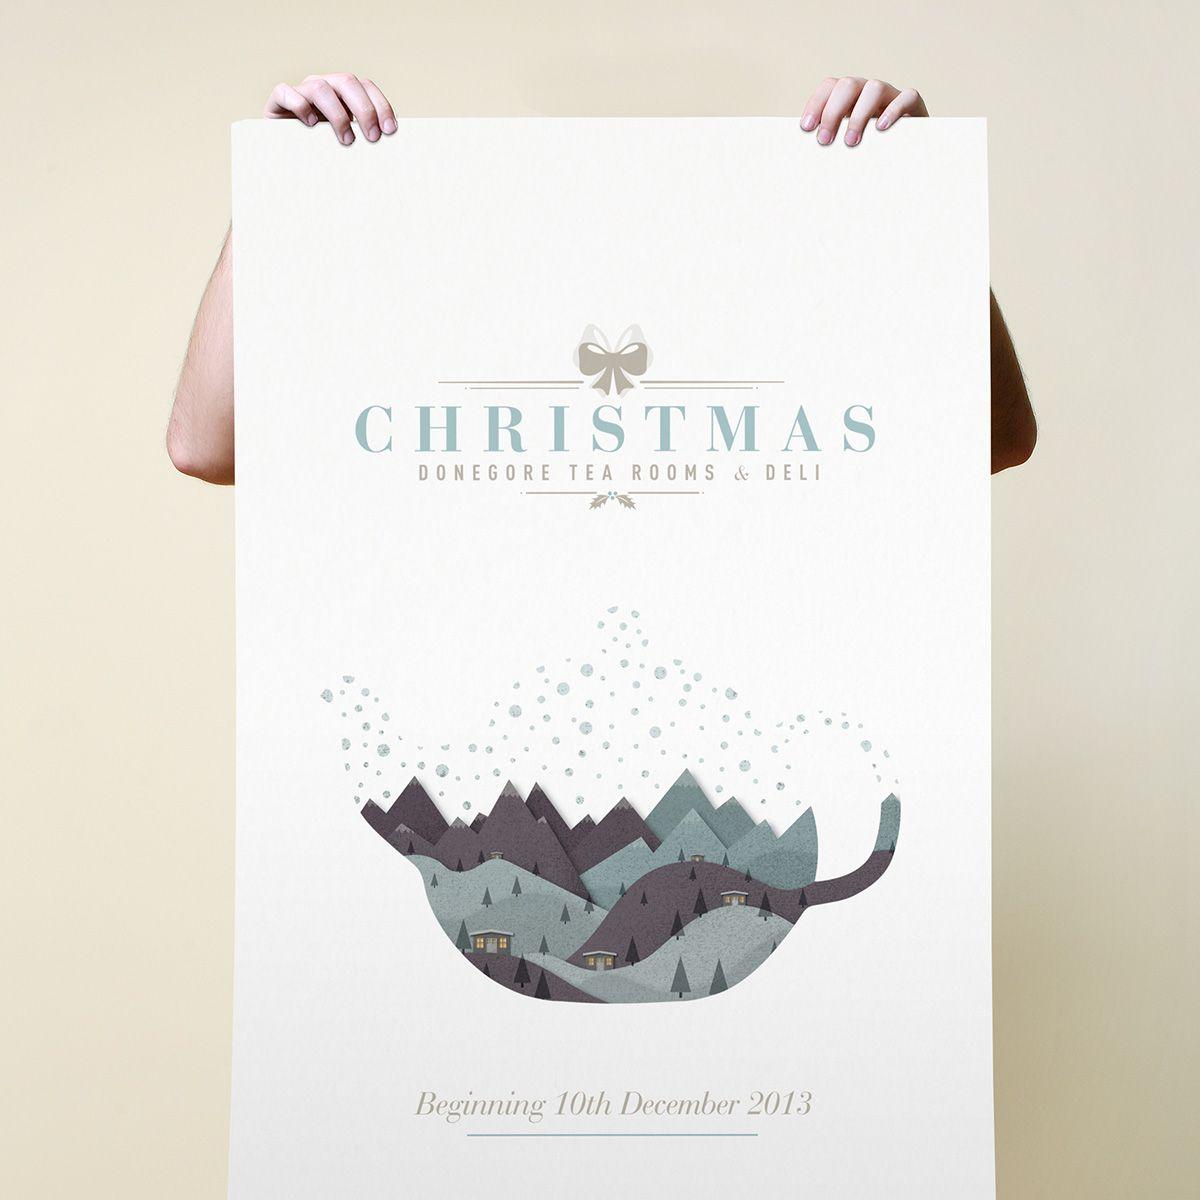 We Are Duo Graphic Web Design Belfast Northern Ireland Donegore Online Web Design Web Design Tutorials Website Design Wordpress